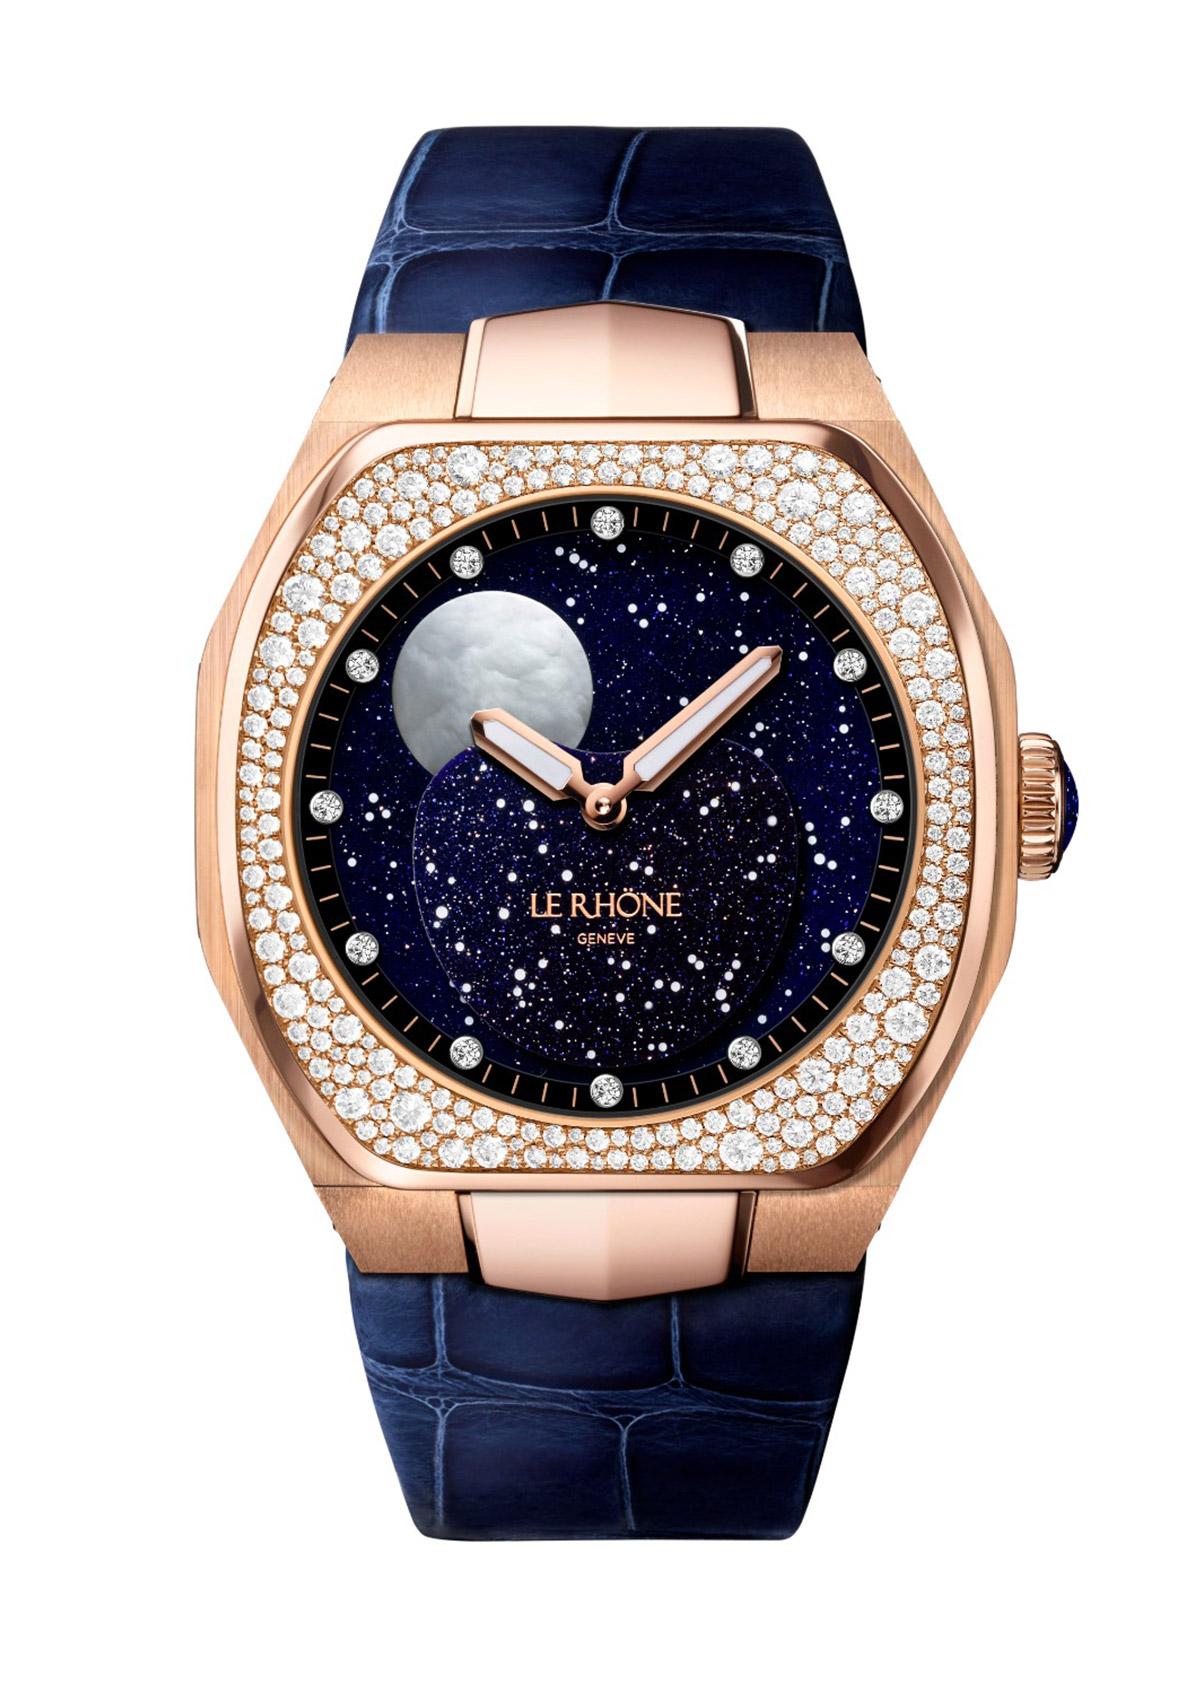 moon-41-le-rhone-watch-H3PG251-1-A51D